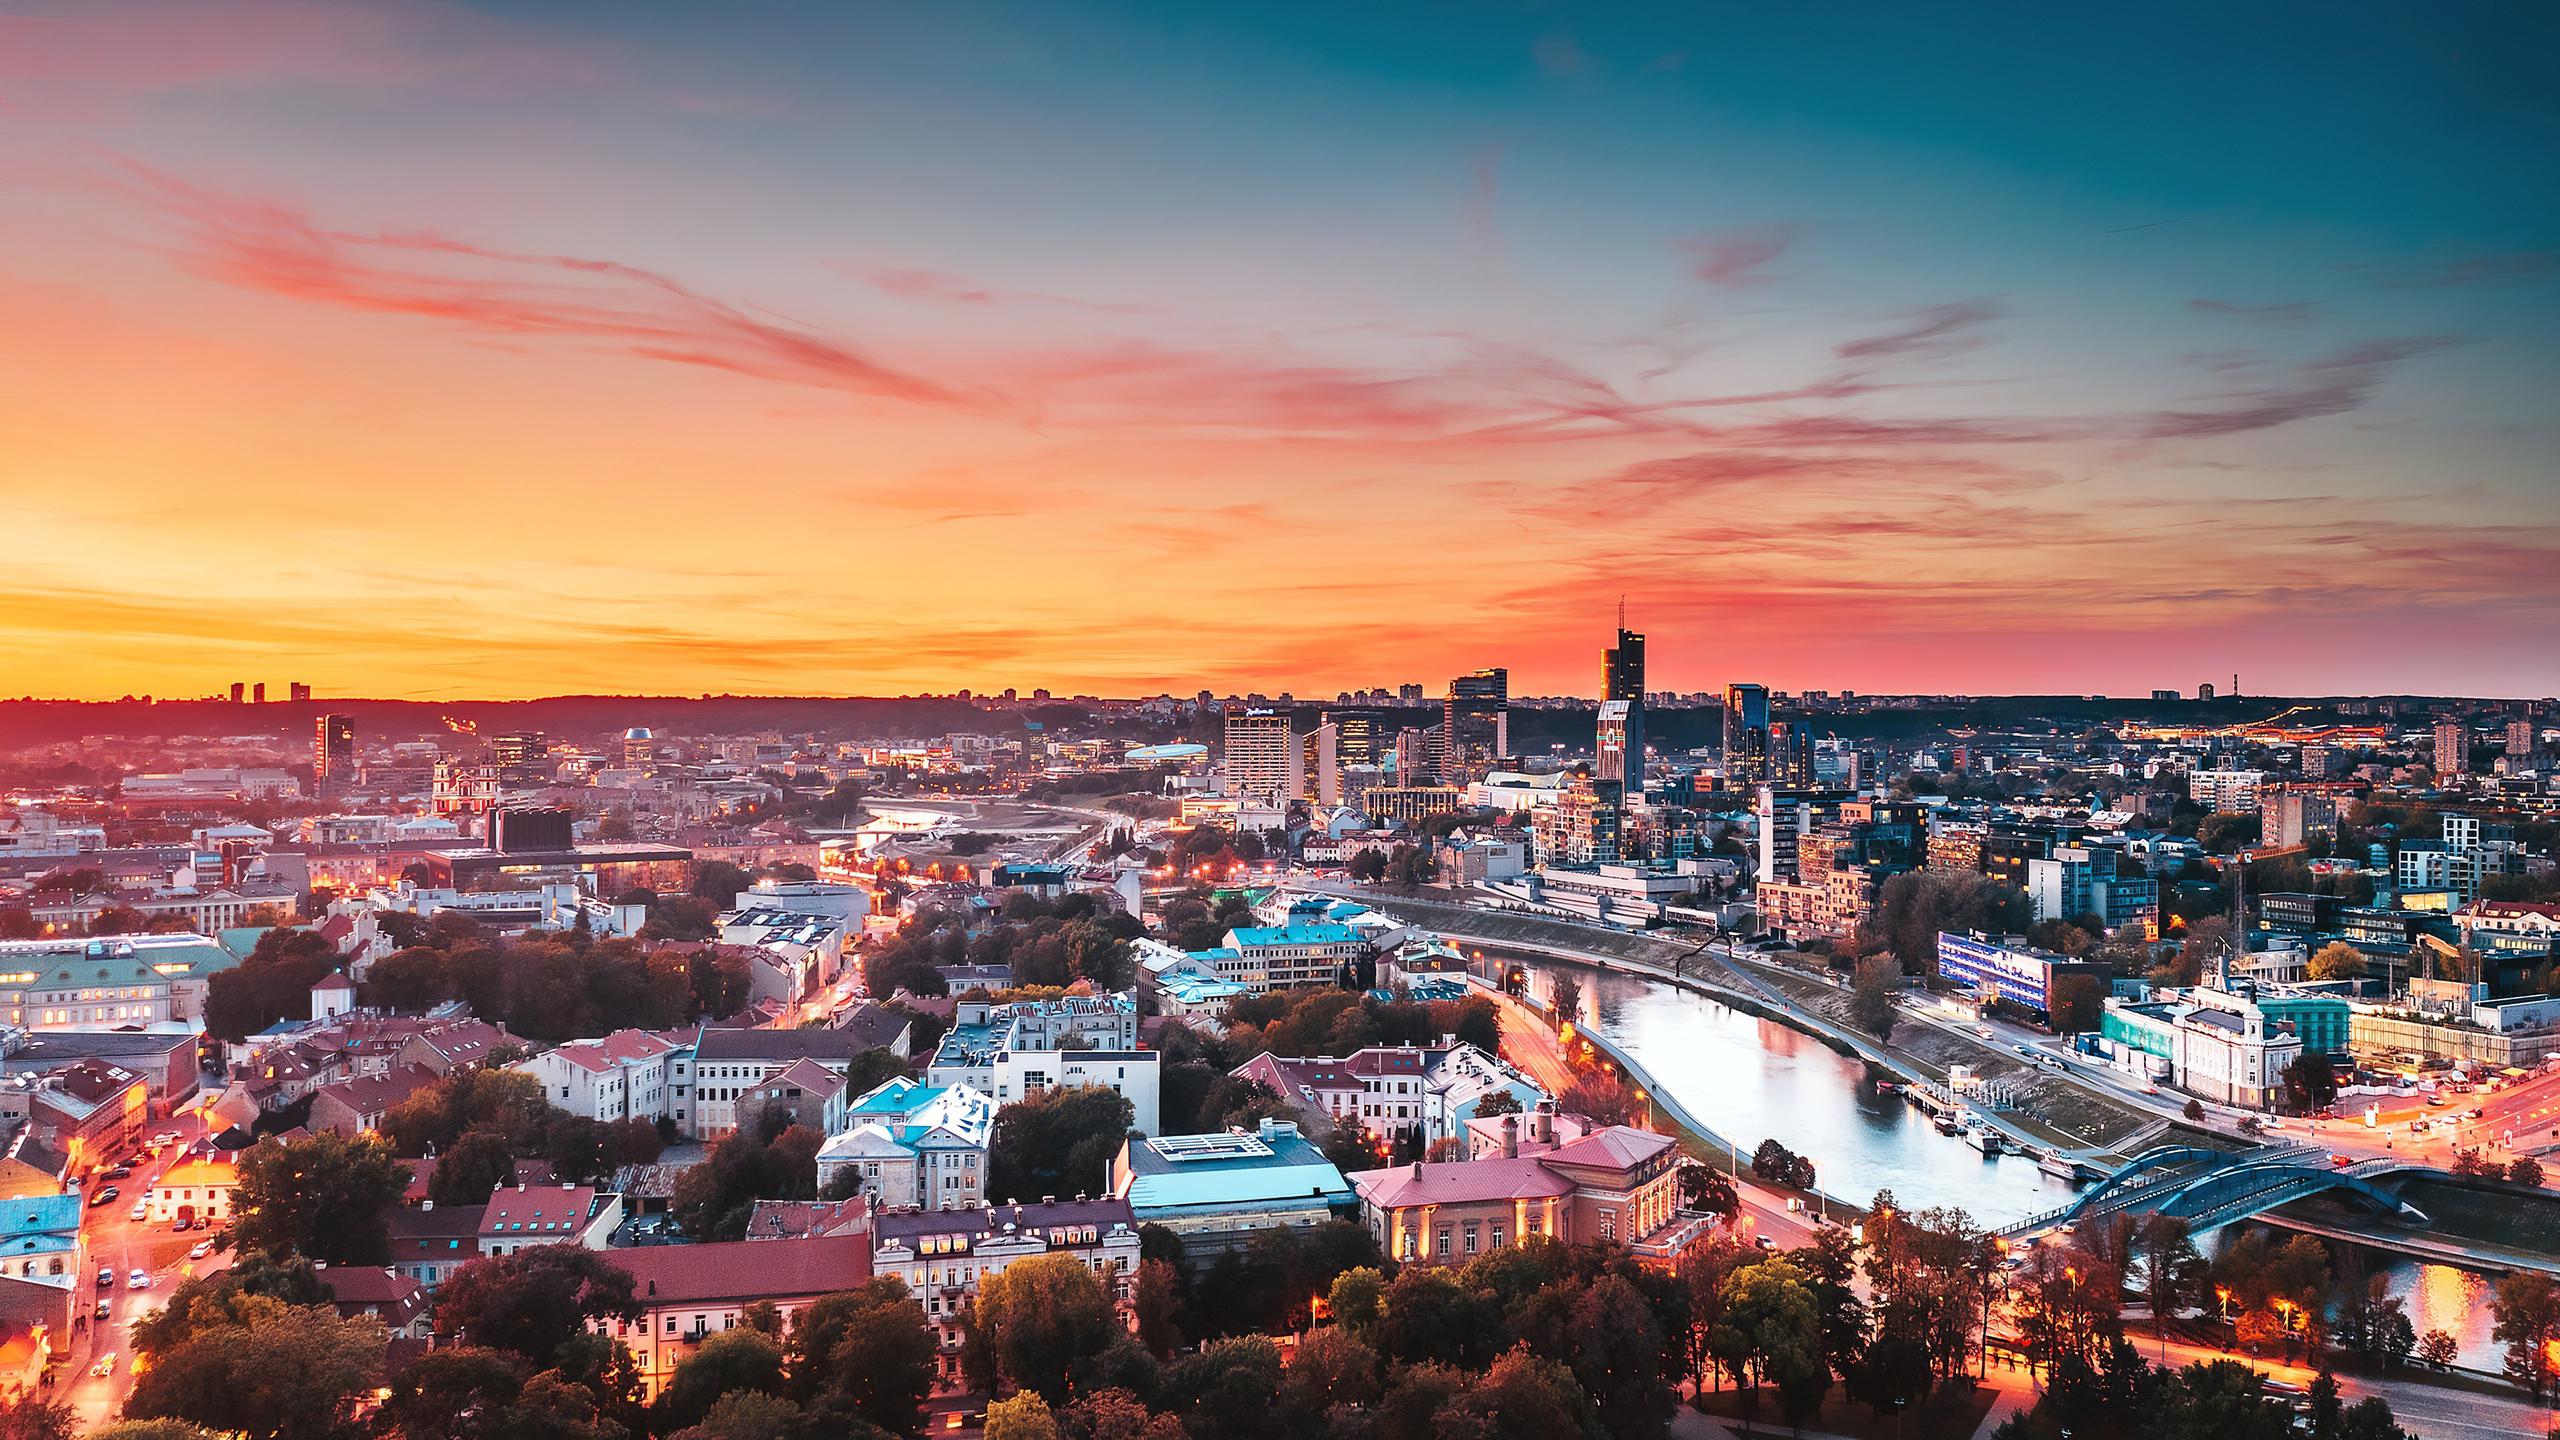 vilnius-cityscape-4k-el.jpg